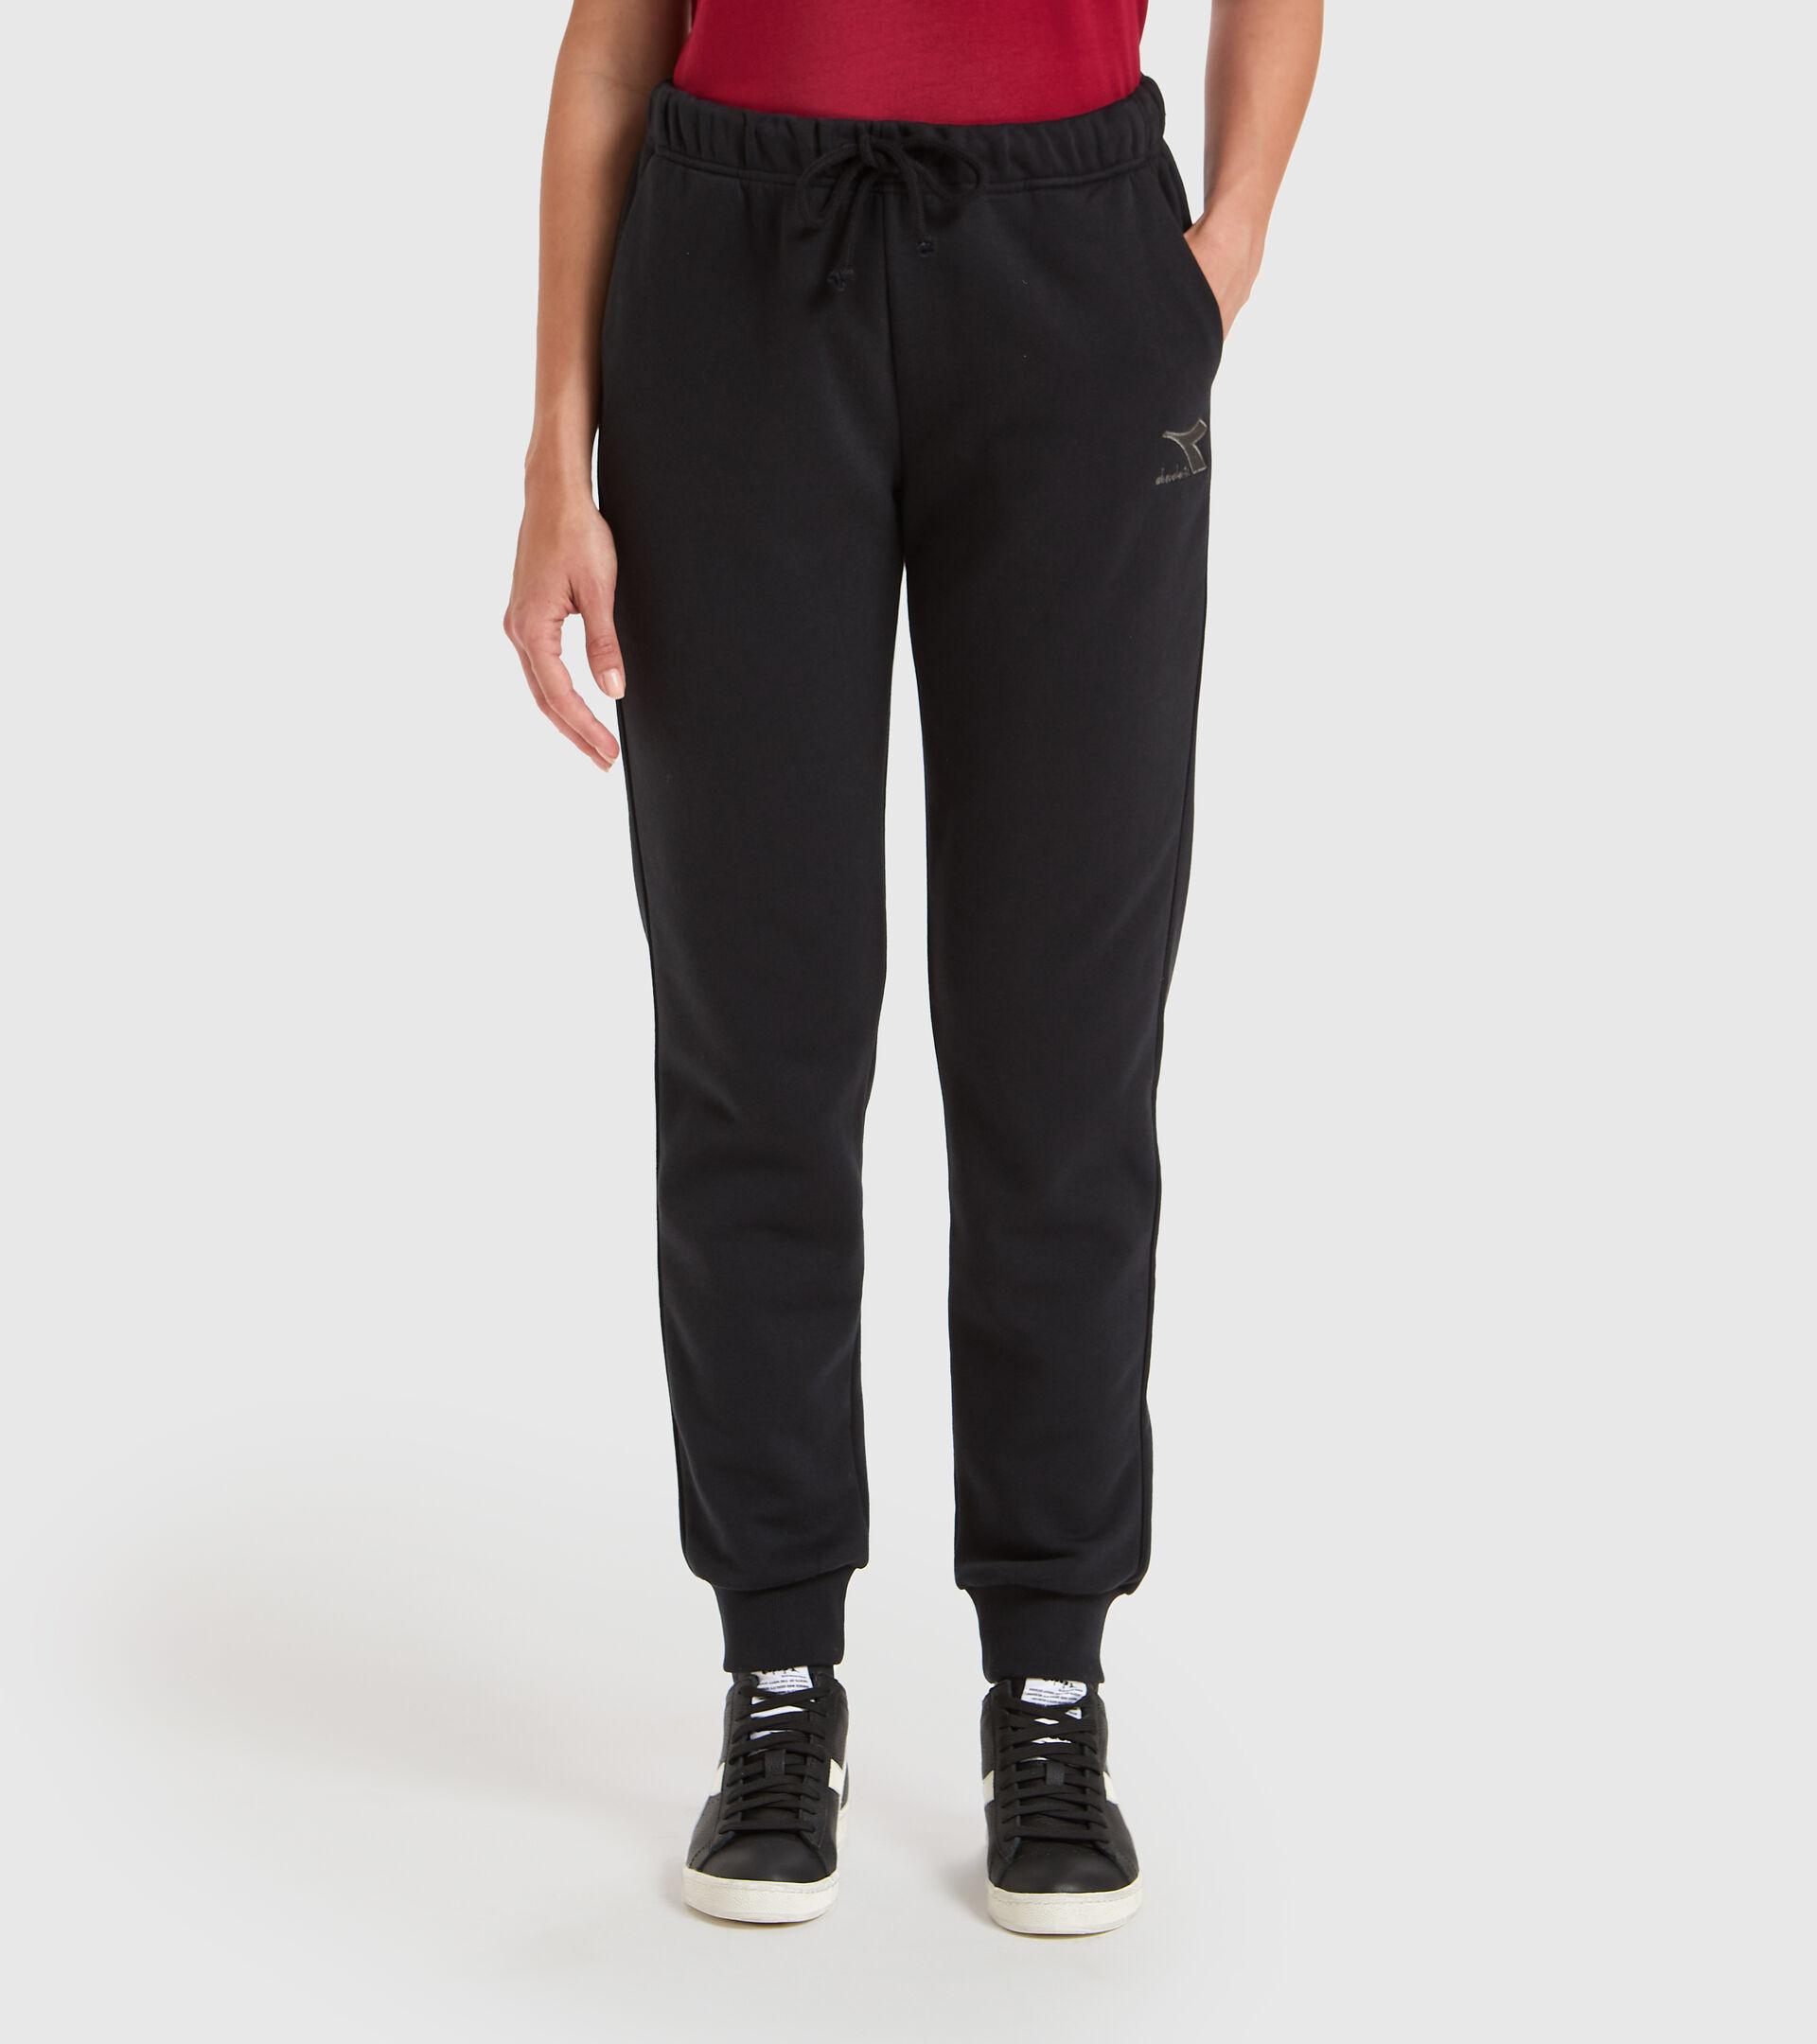 Pantalones deportivos - Mujer L.PANTS CUFF CORE NEGRO - Diadora